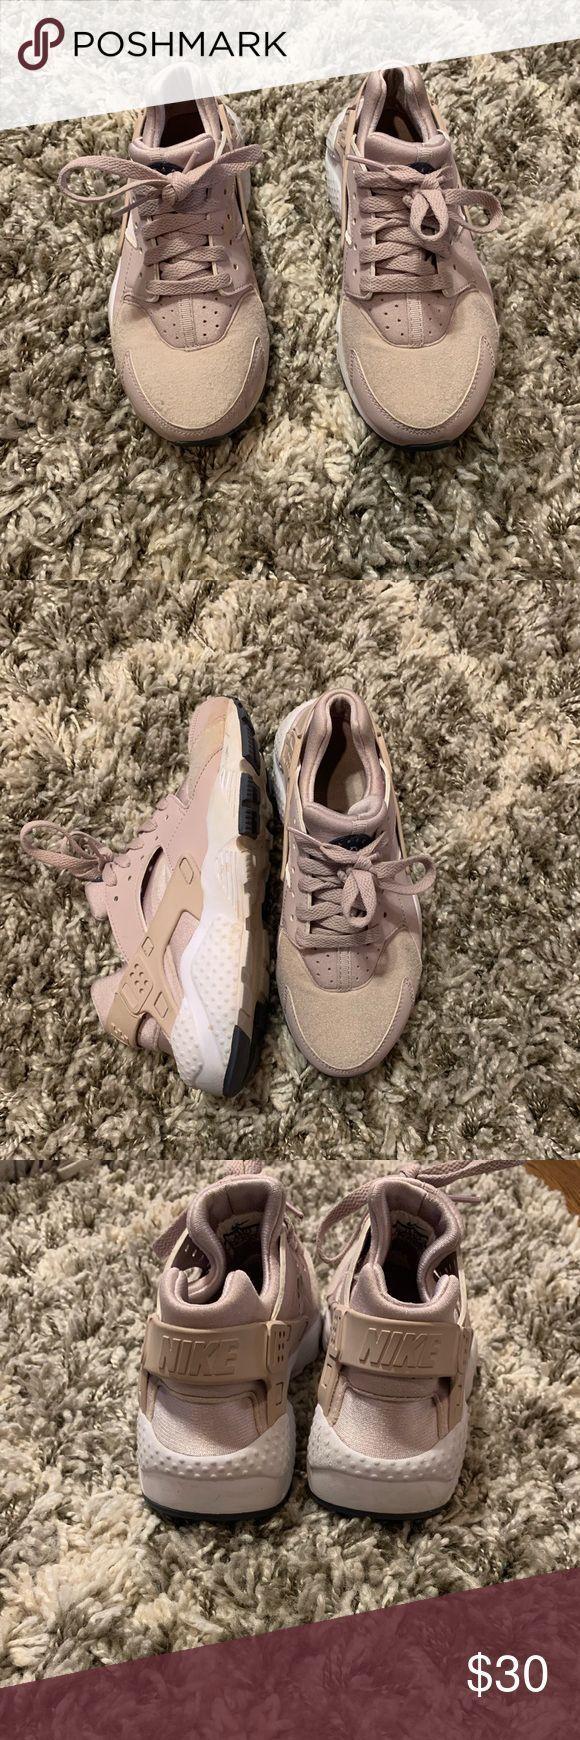 Nike Huarache Rose Gold Guter Zustand !! Nike Shoes Sportschuhe ...